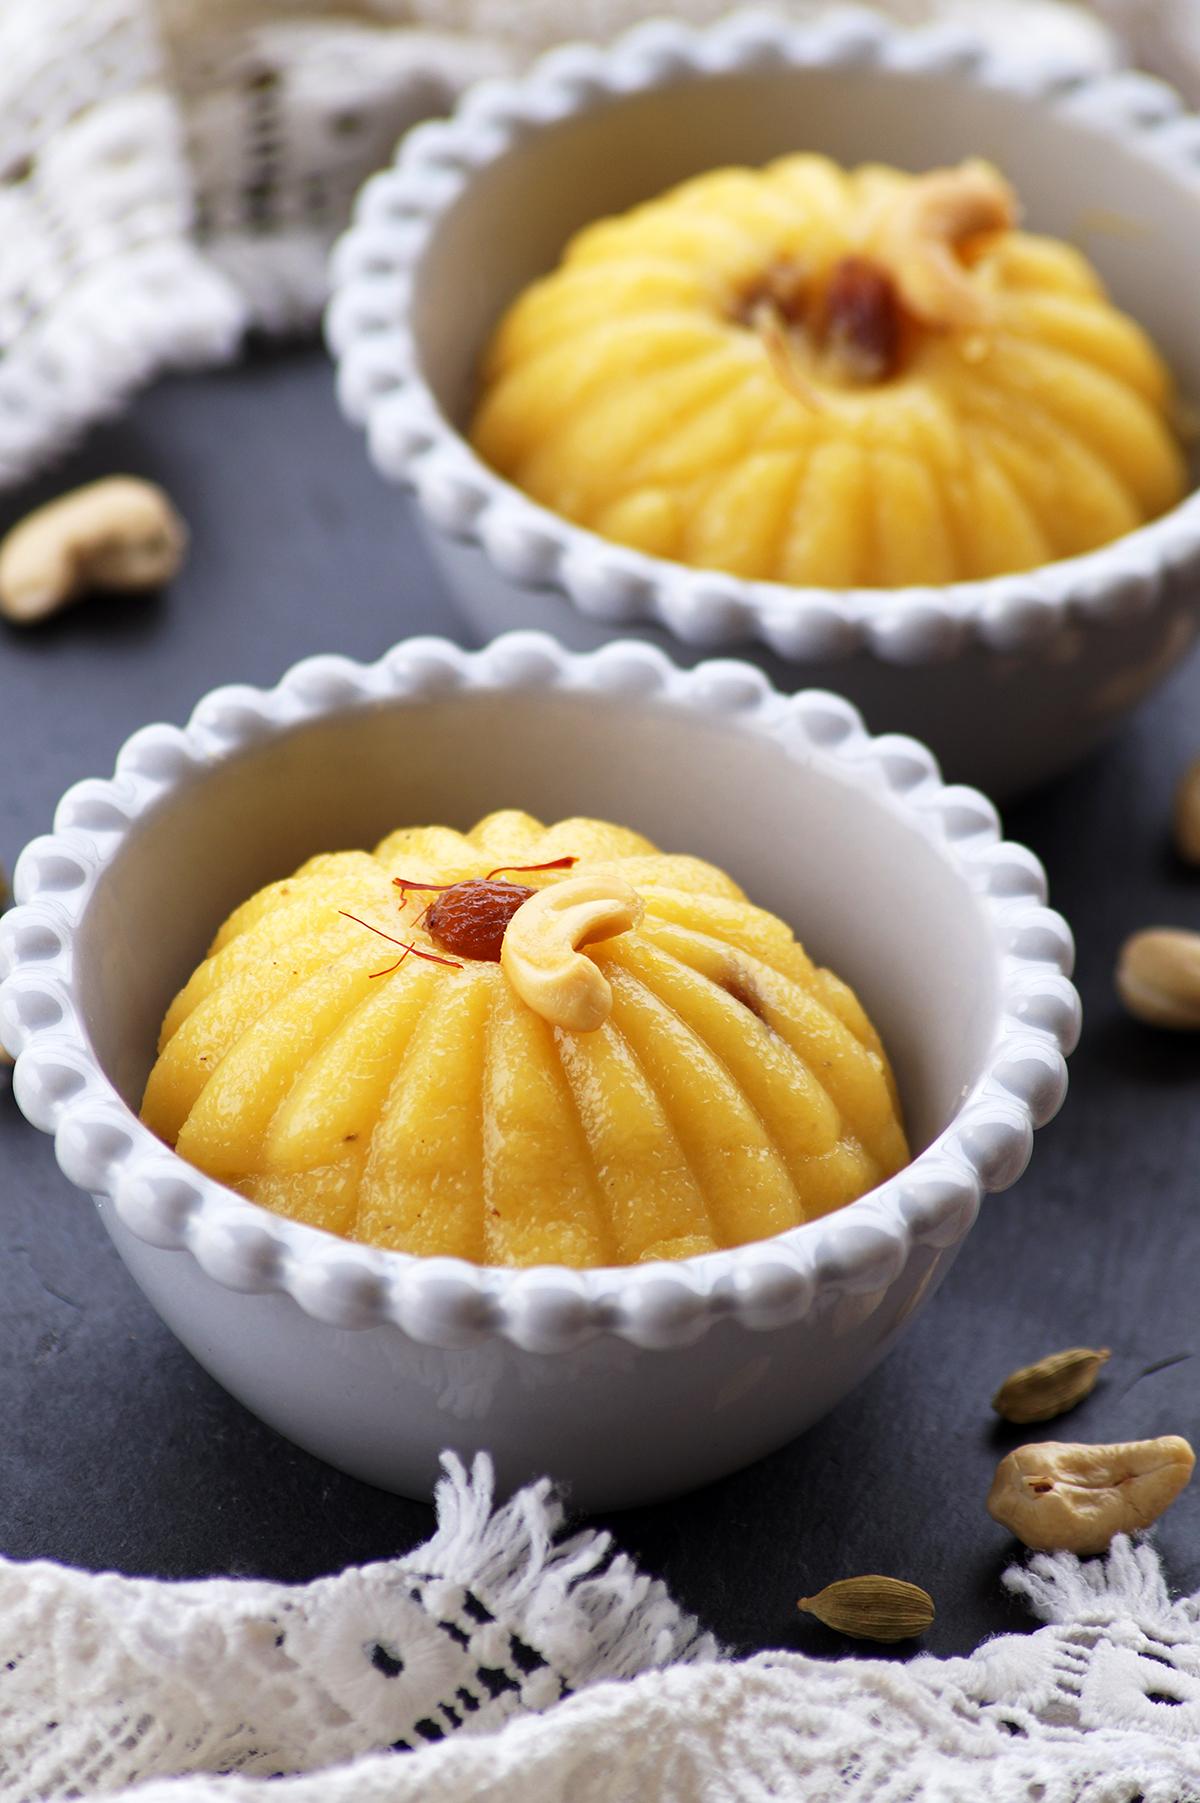 mango kesari or mango semolina pudding topped with saffron, cashews and raisins, served in two bowls.